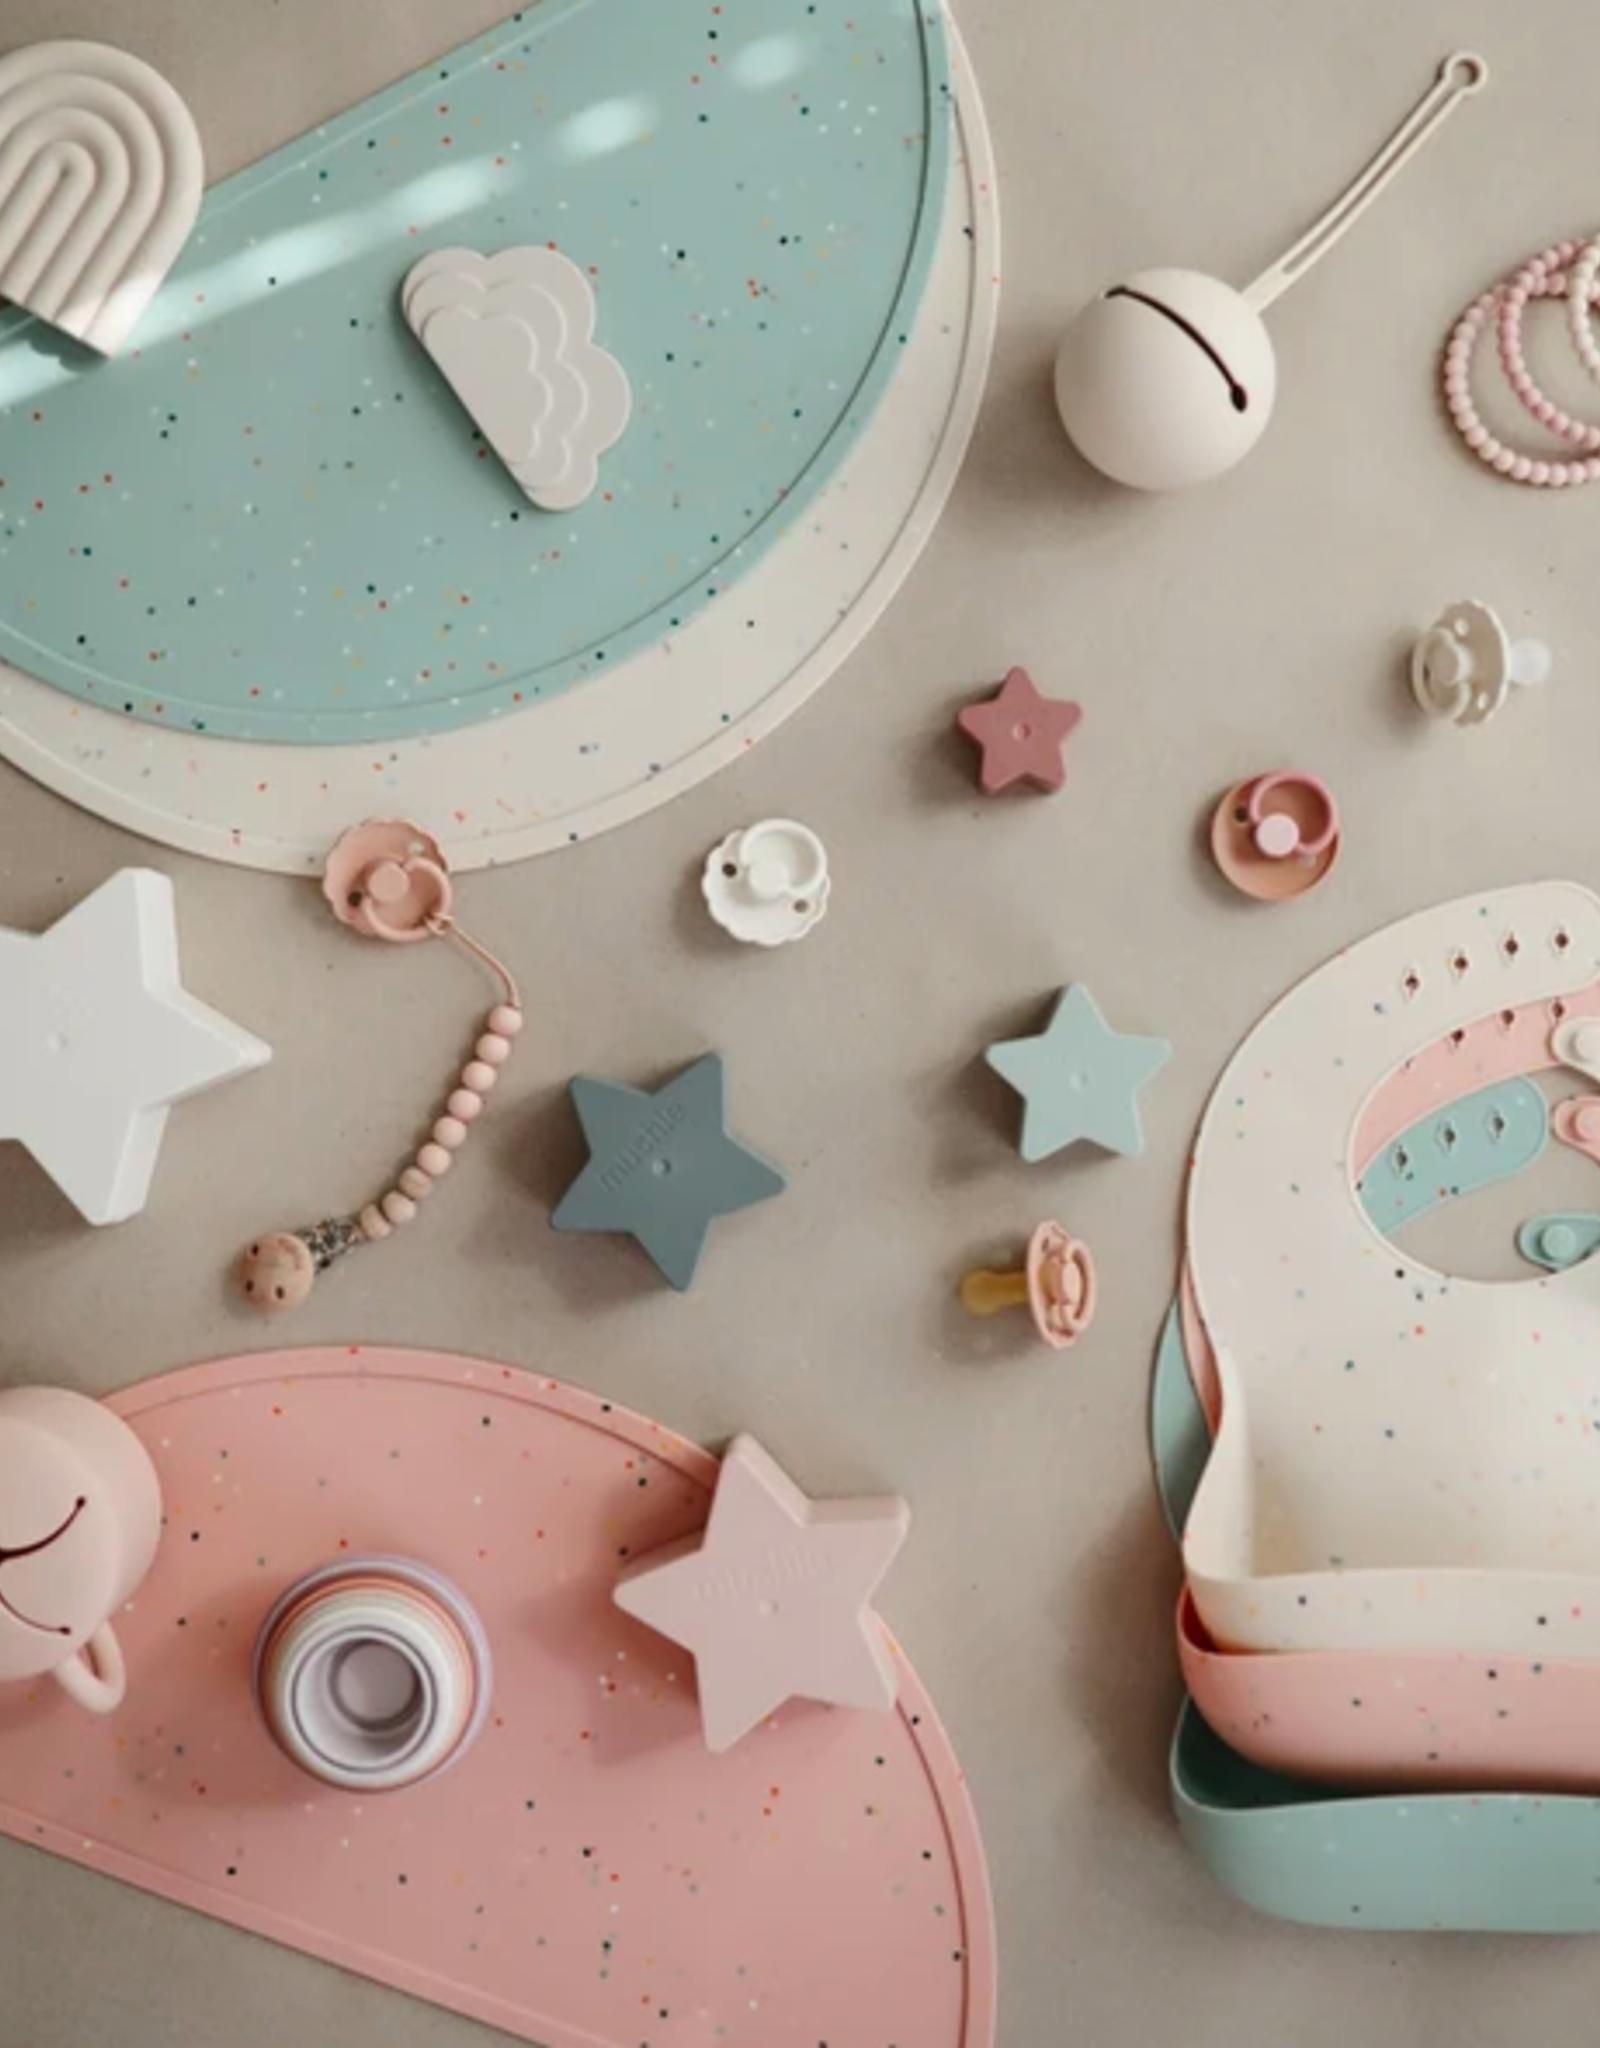 Silicone Place Mat - Powder Pink Confetti